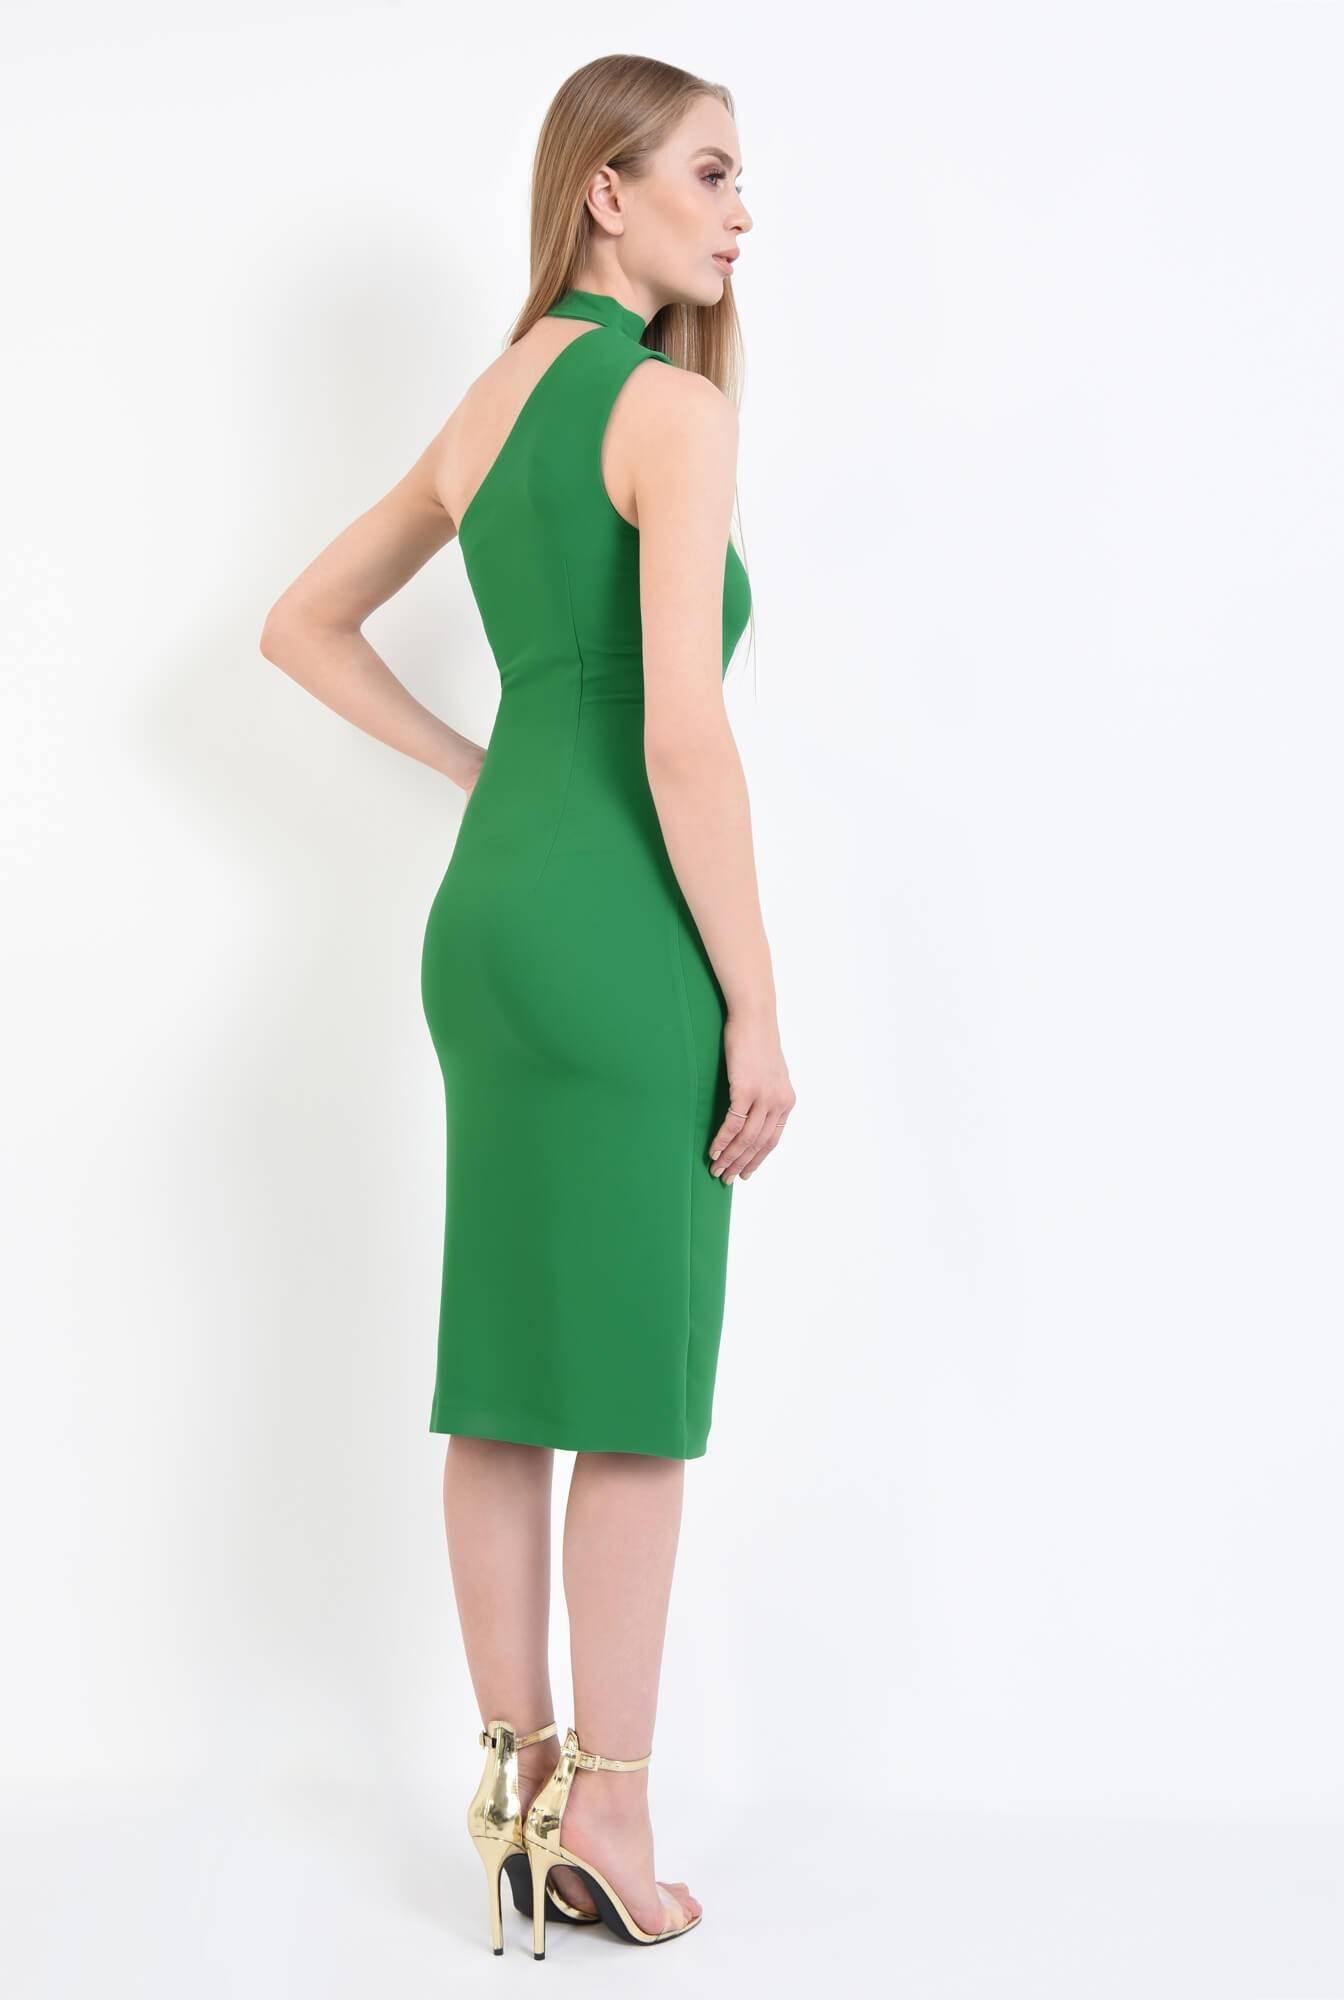 1 - Rochie verde, eleganta, cu umar gol